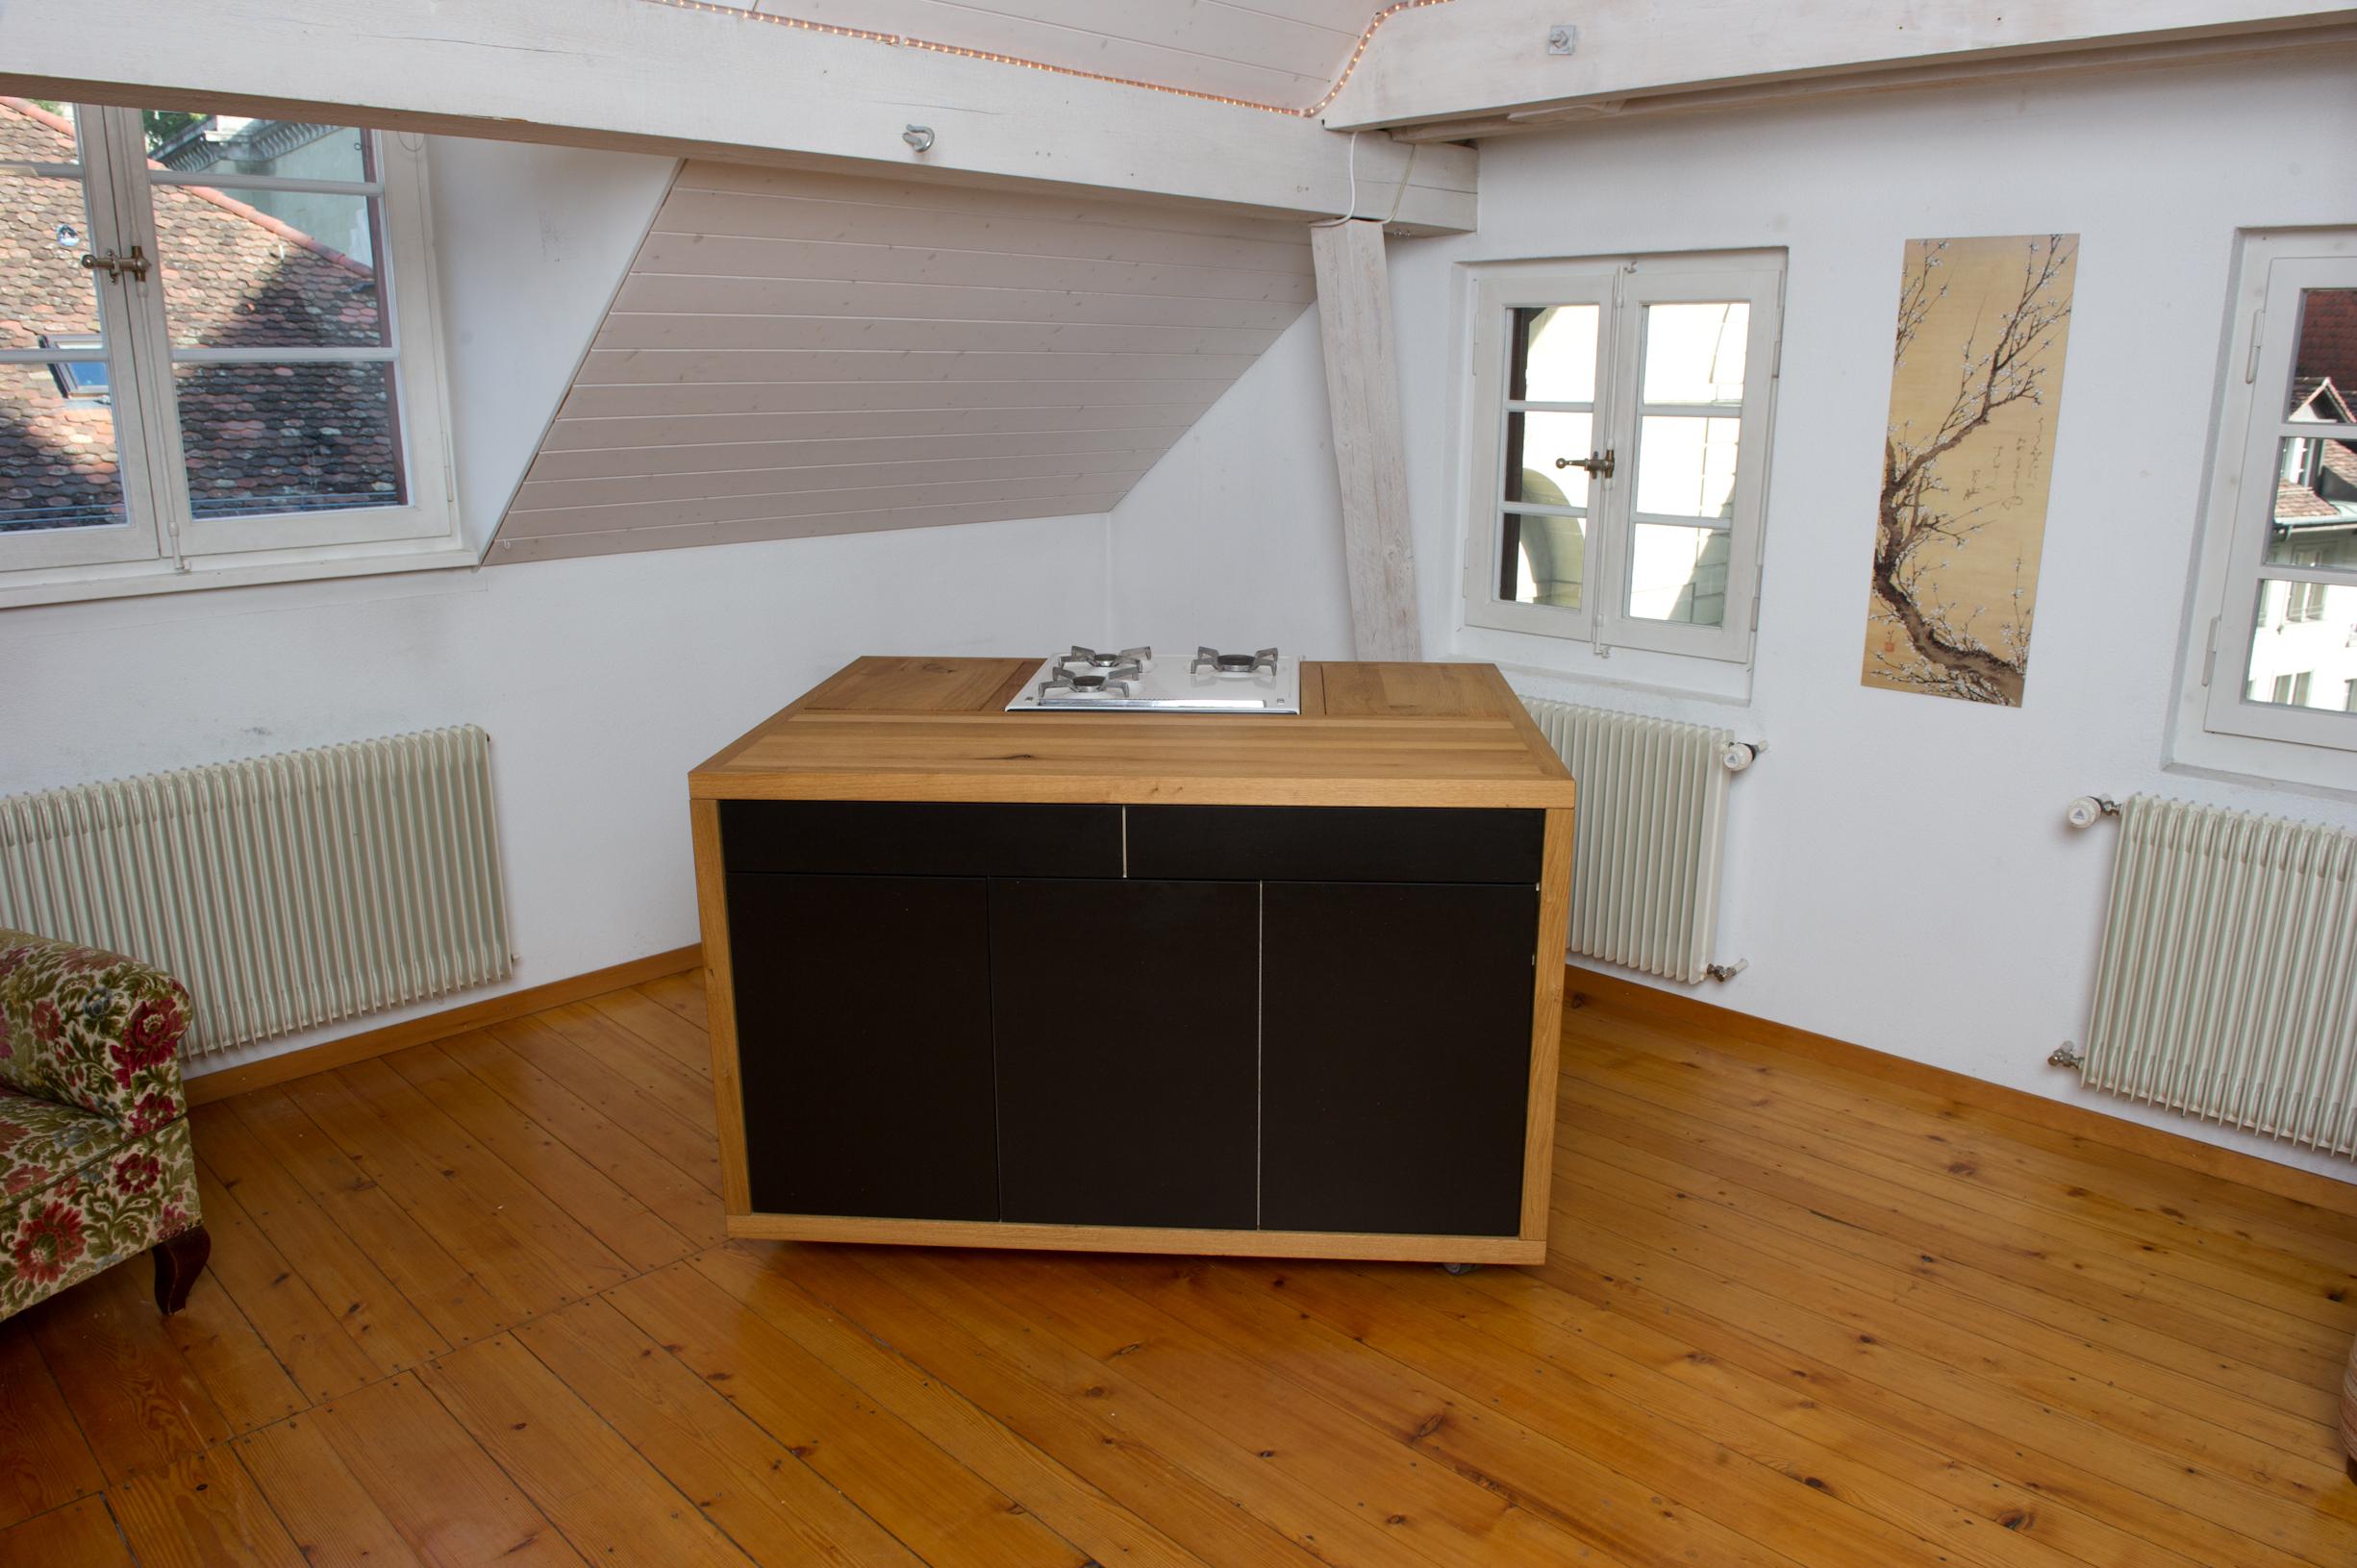 Kochinsel | Schreinerei Holzlabor Bern